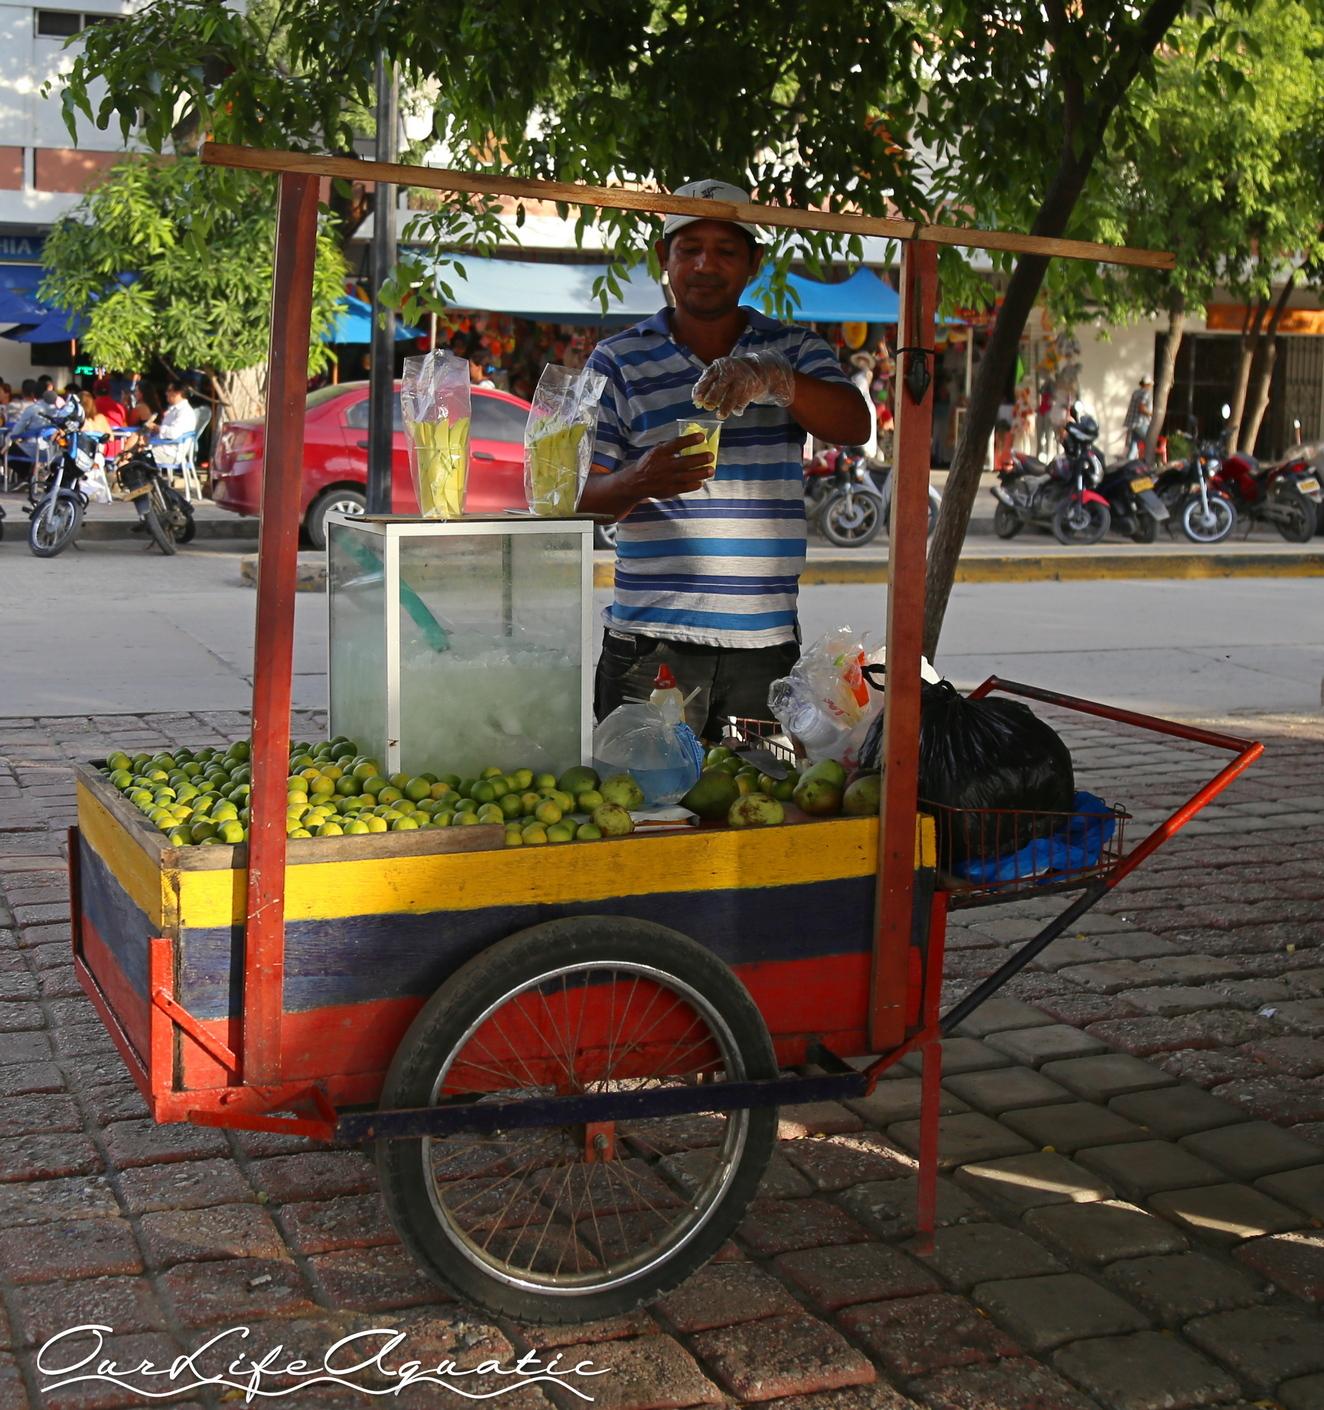 Salted mango vendor